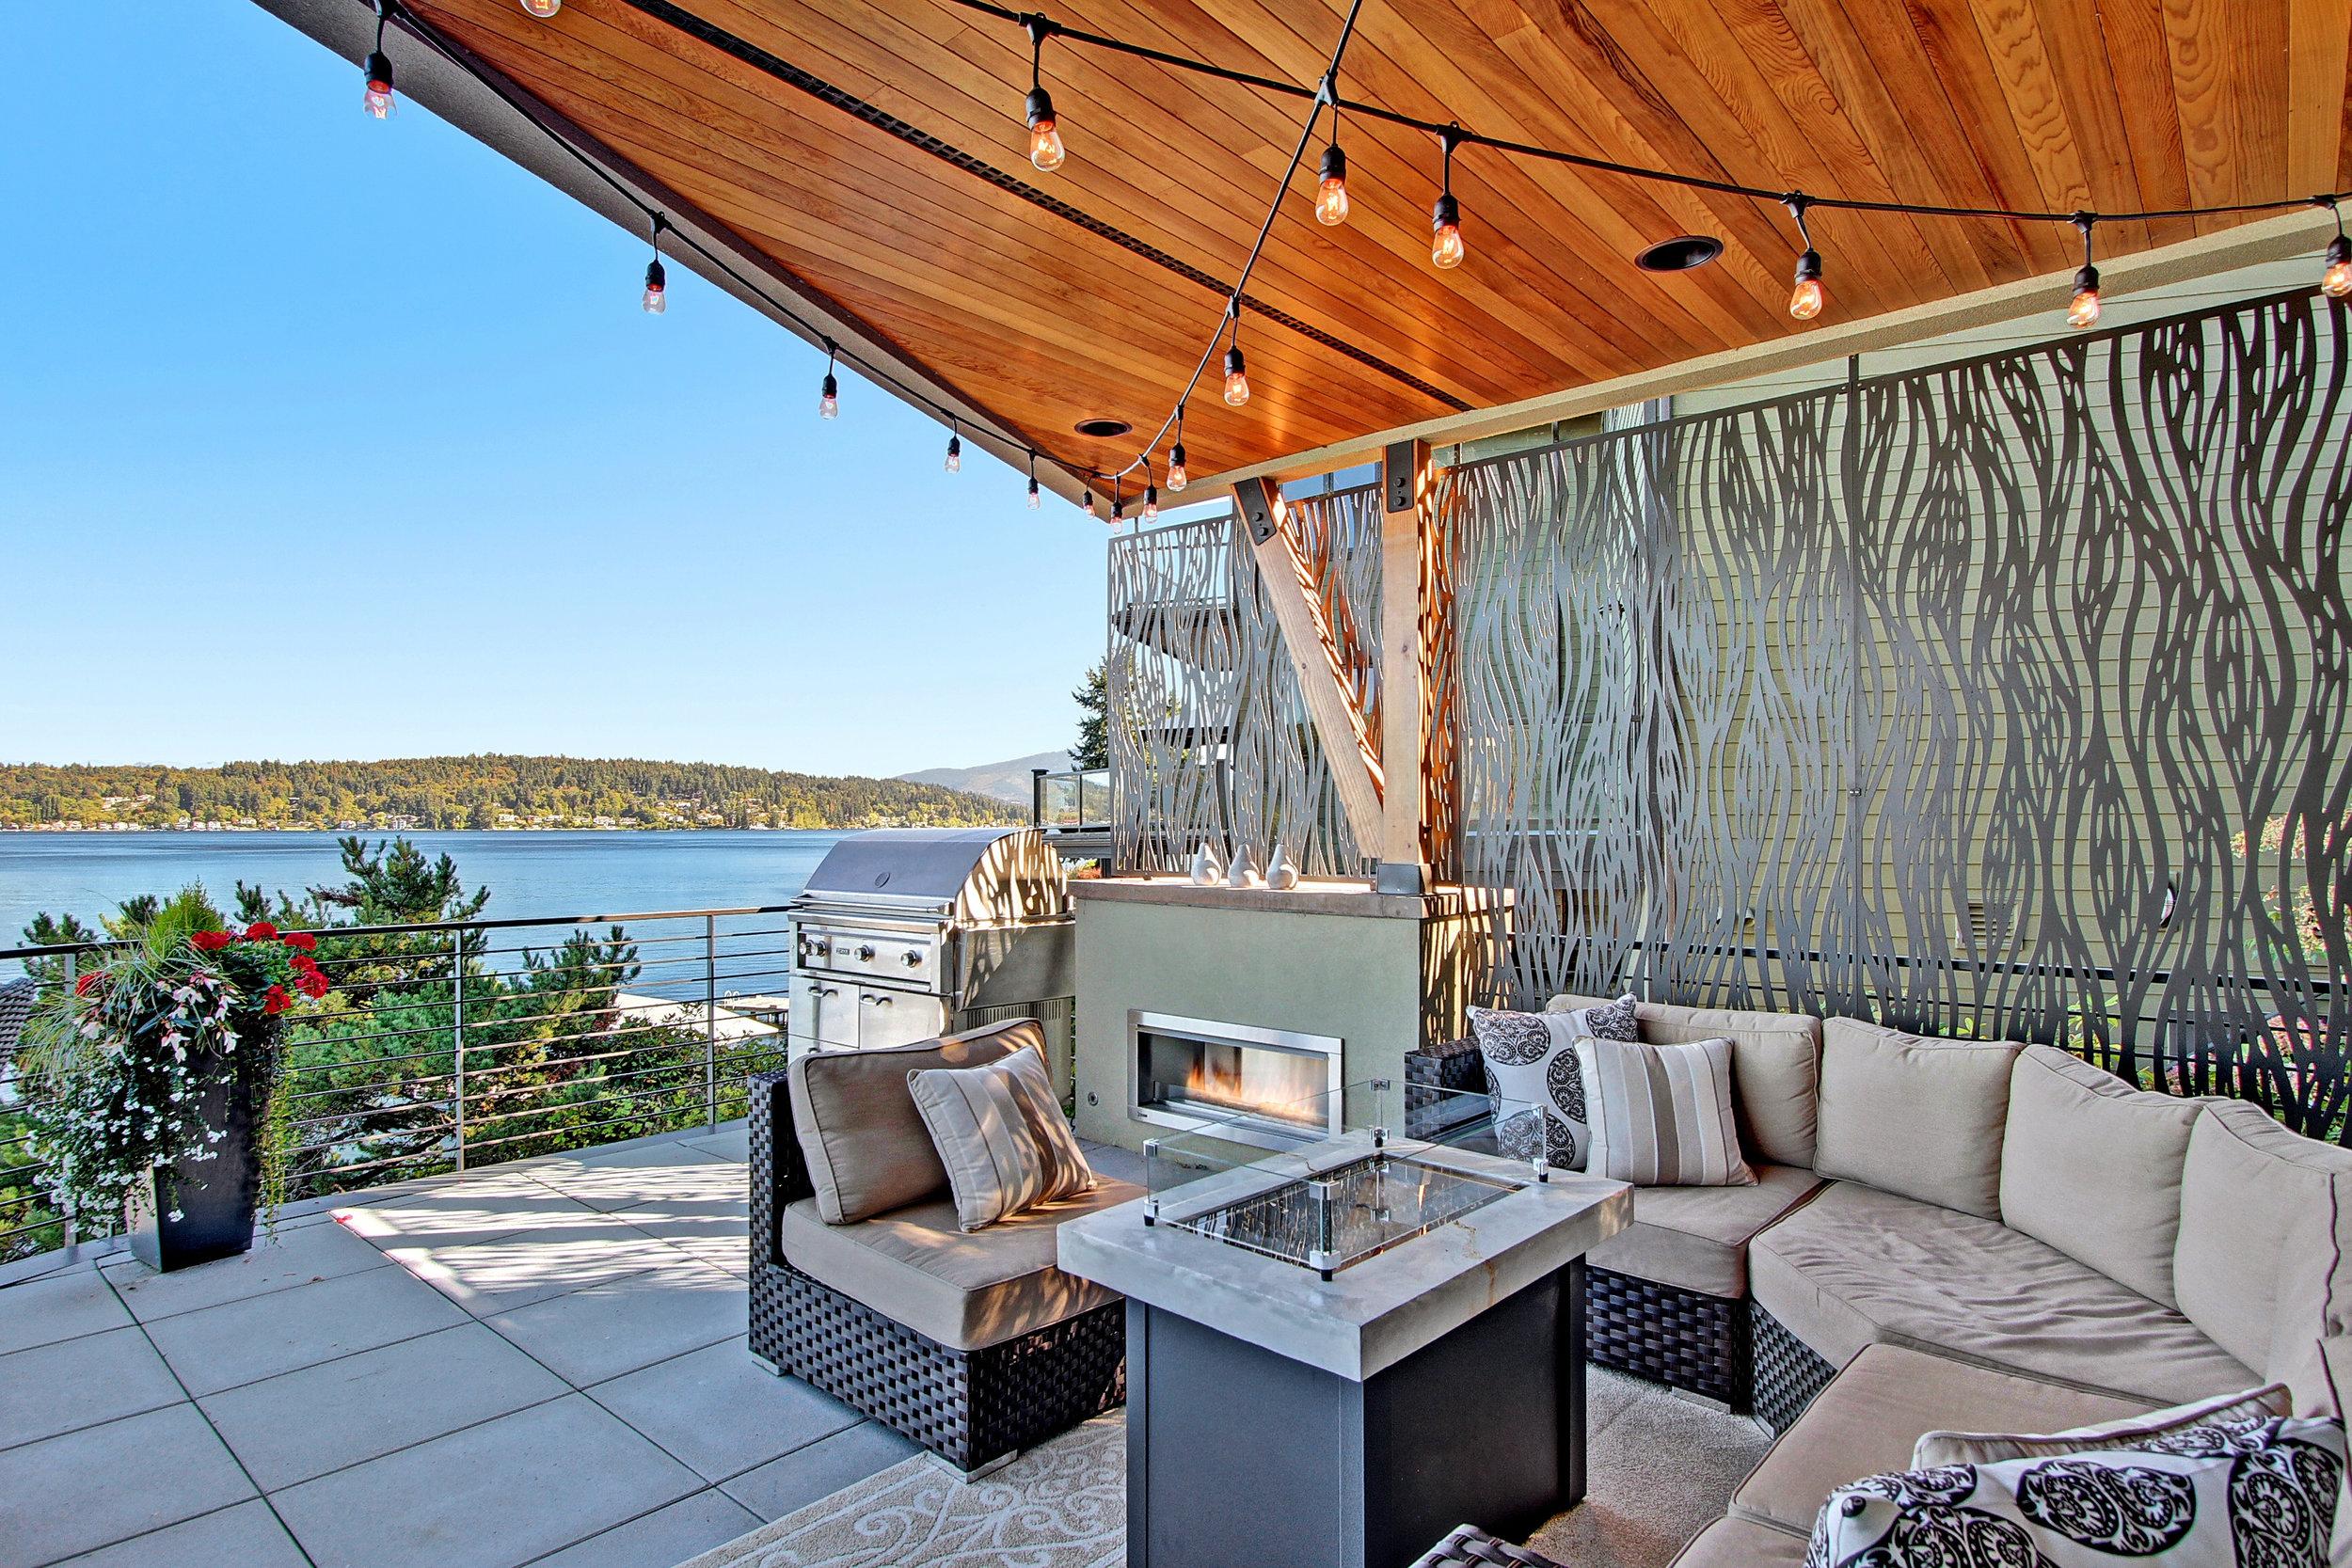 Residence   Waterfall pattern, Metal outdoor panels